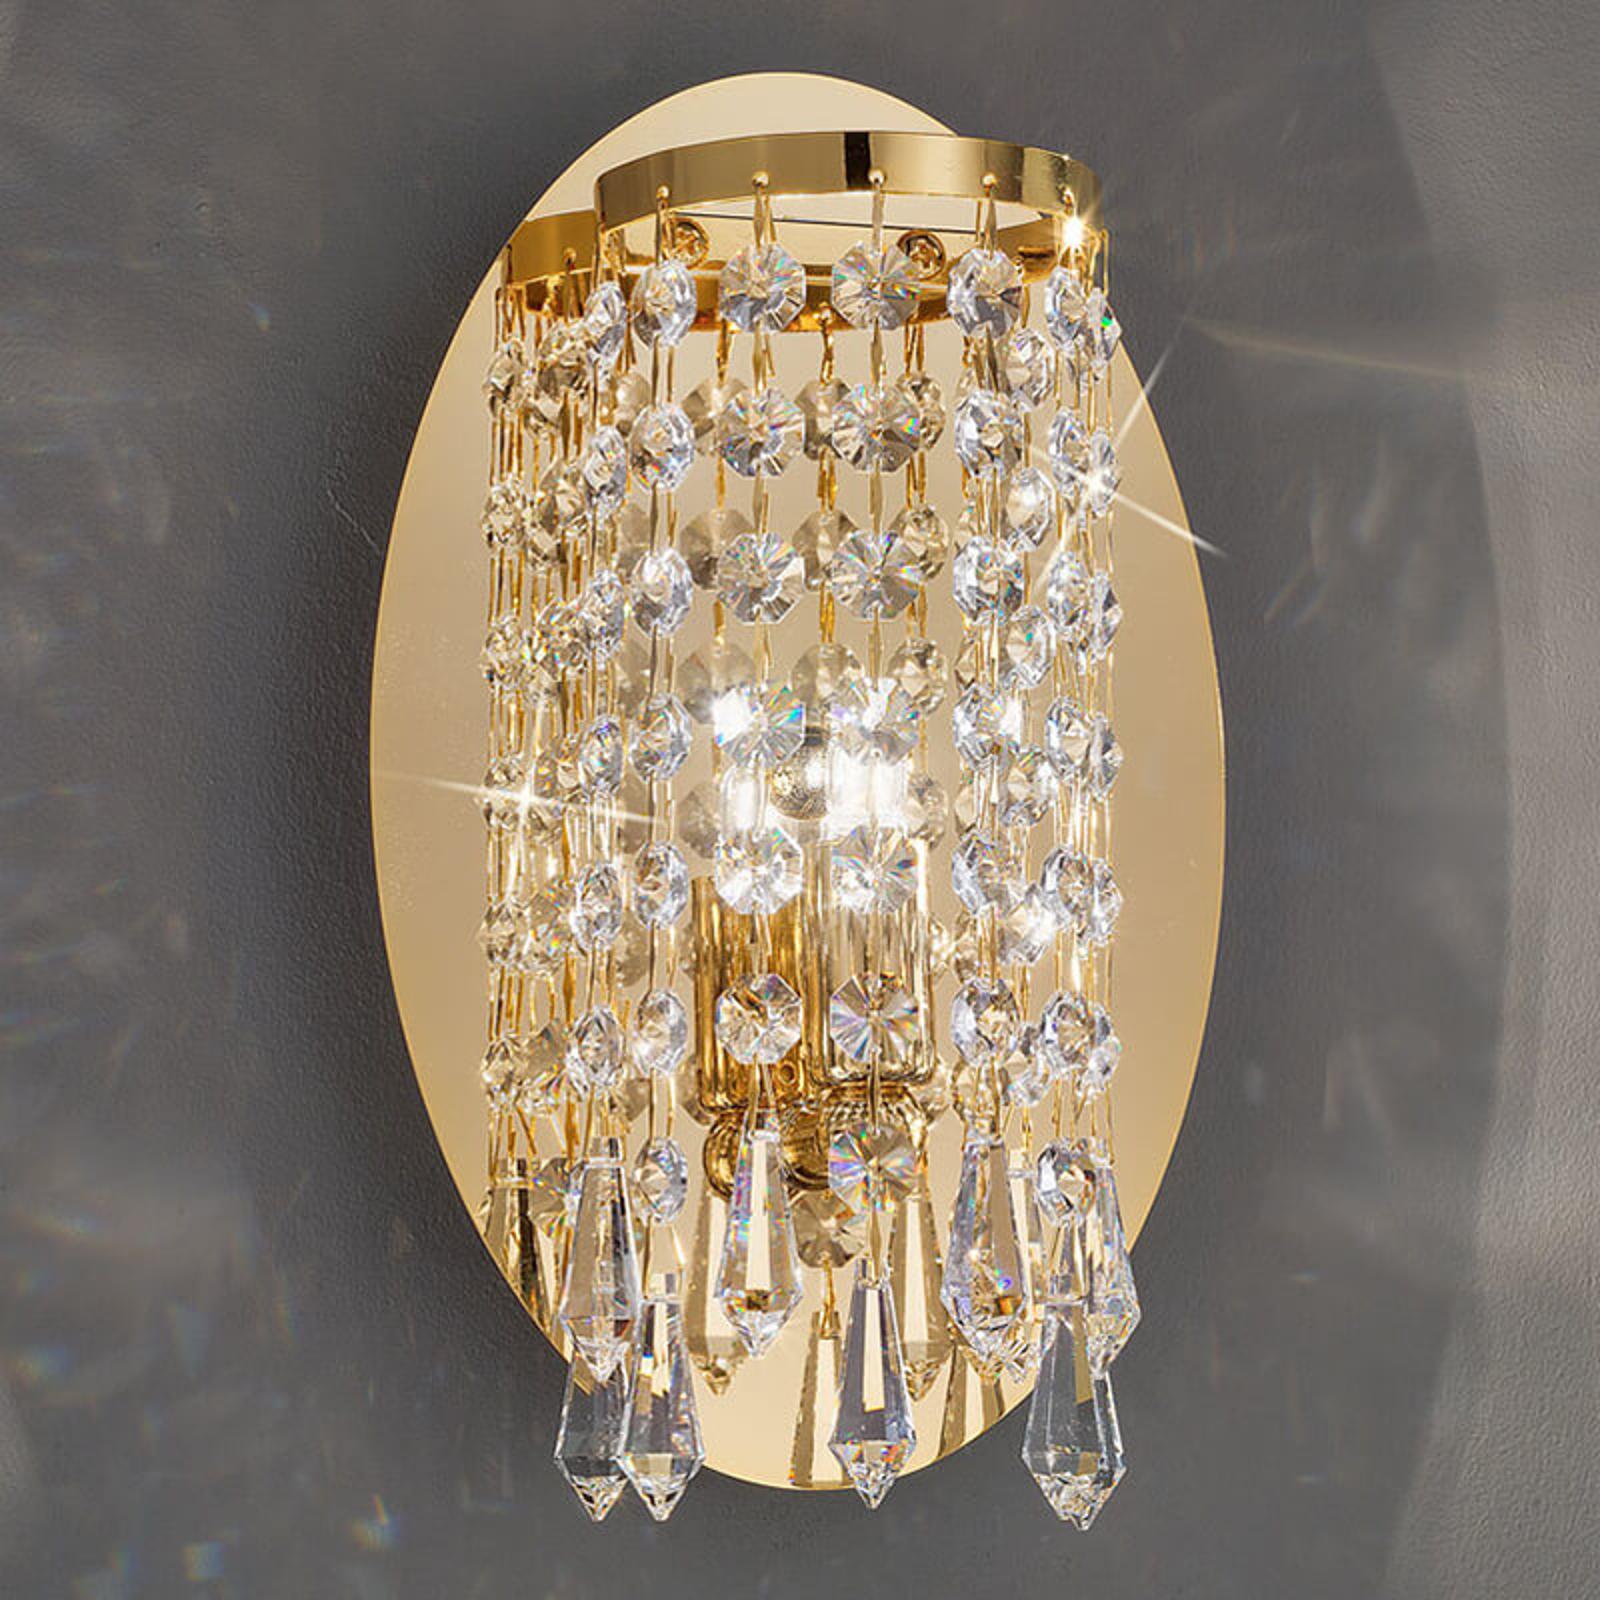 KOLARZ Charleston - Wandleuchte mit Kristall, gold